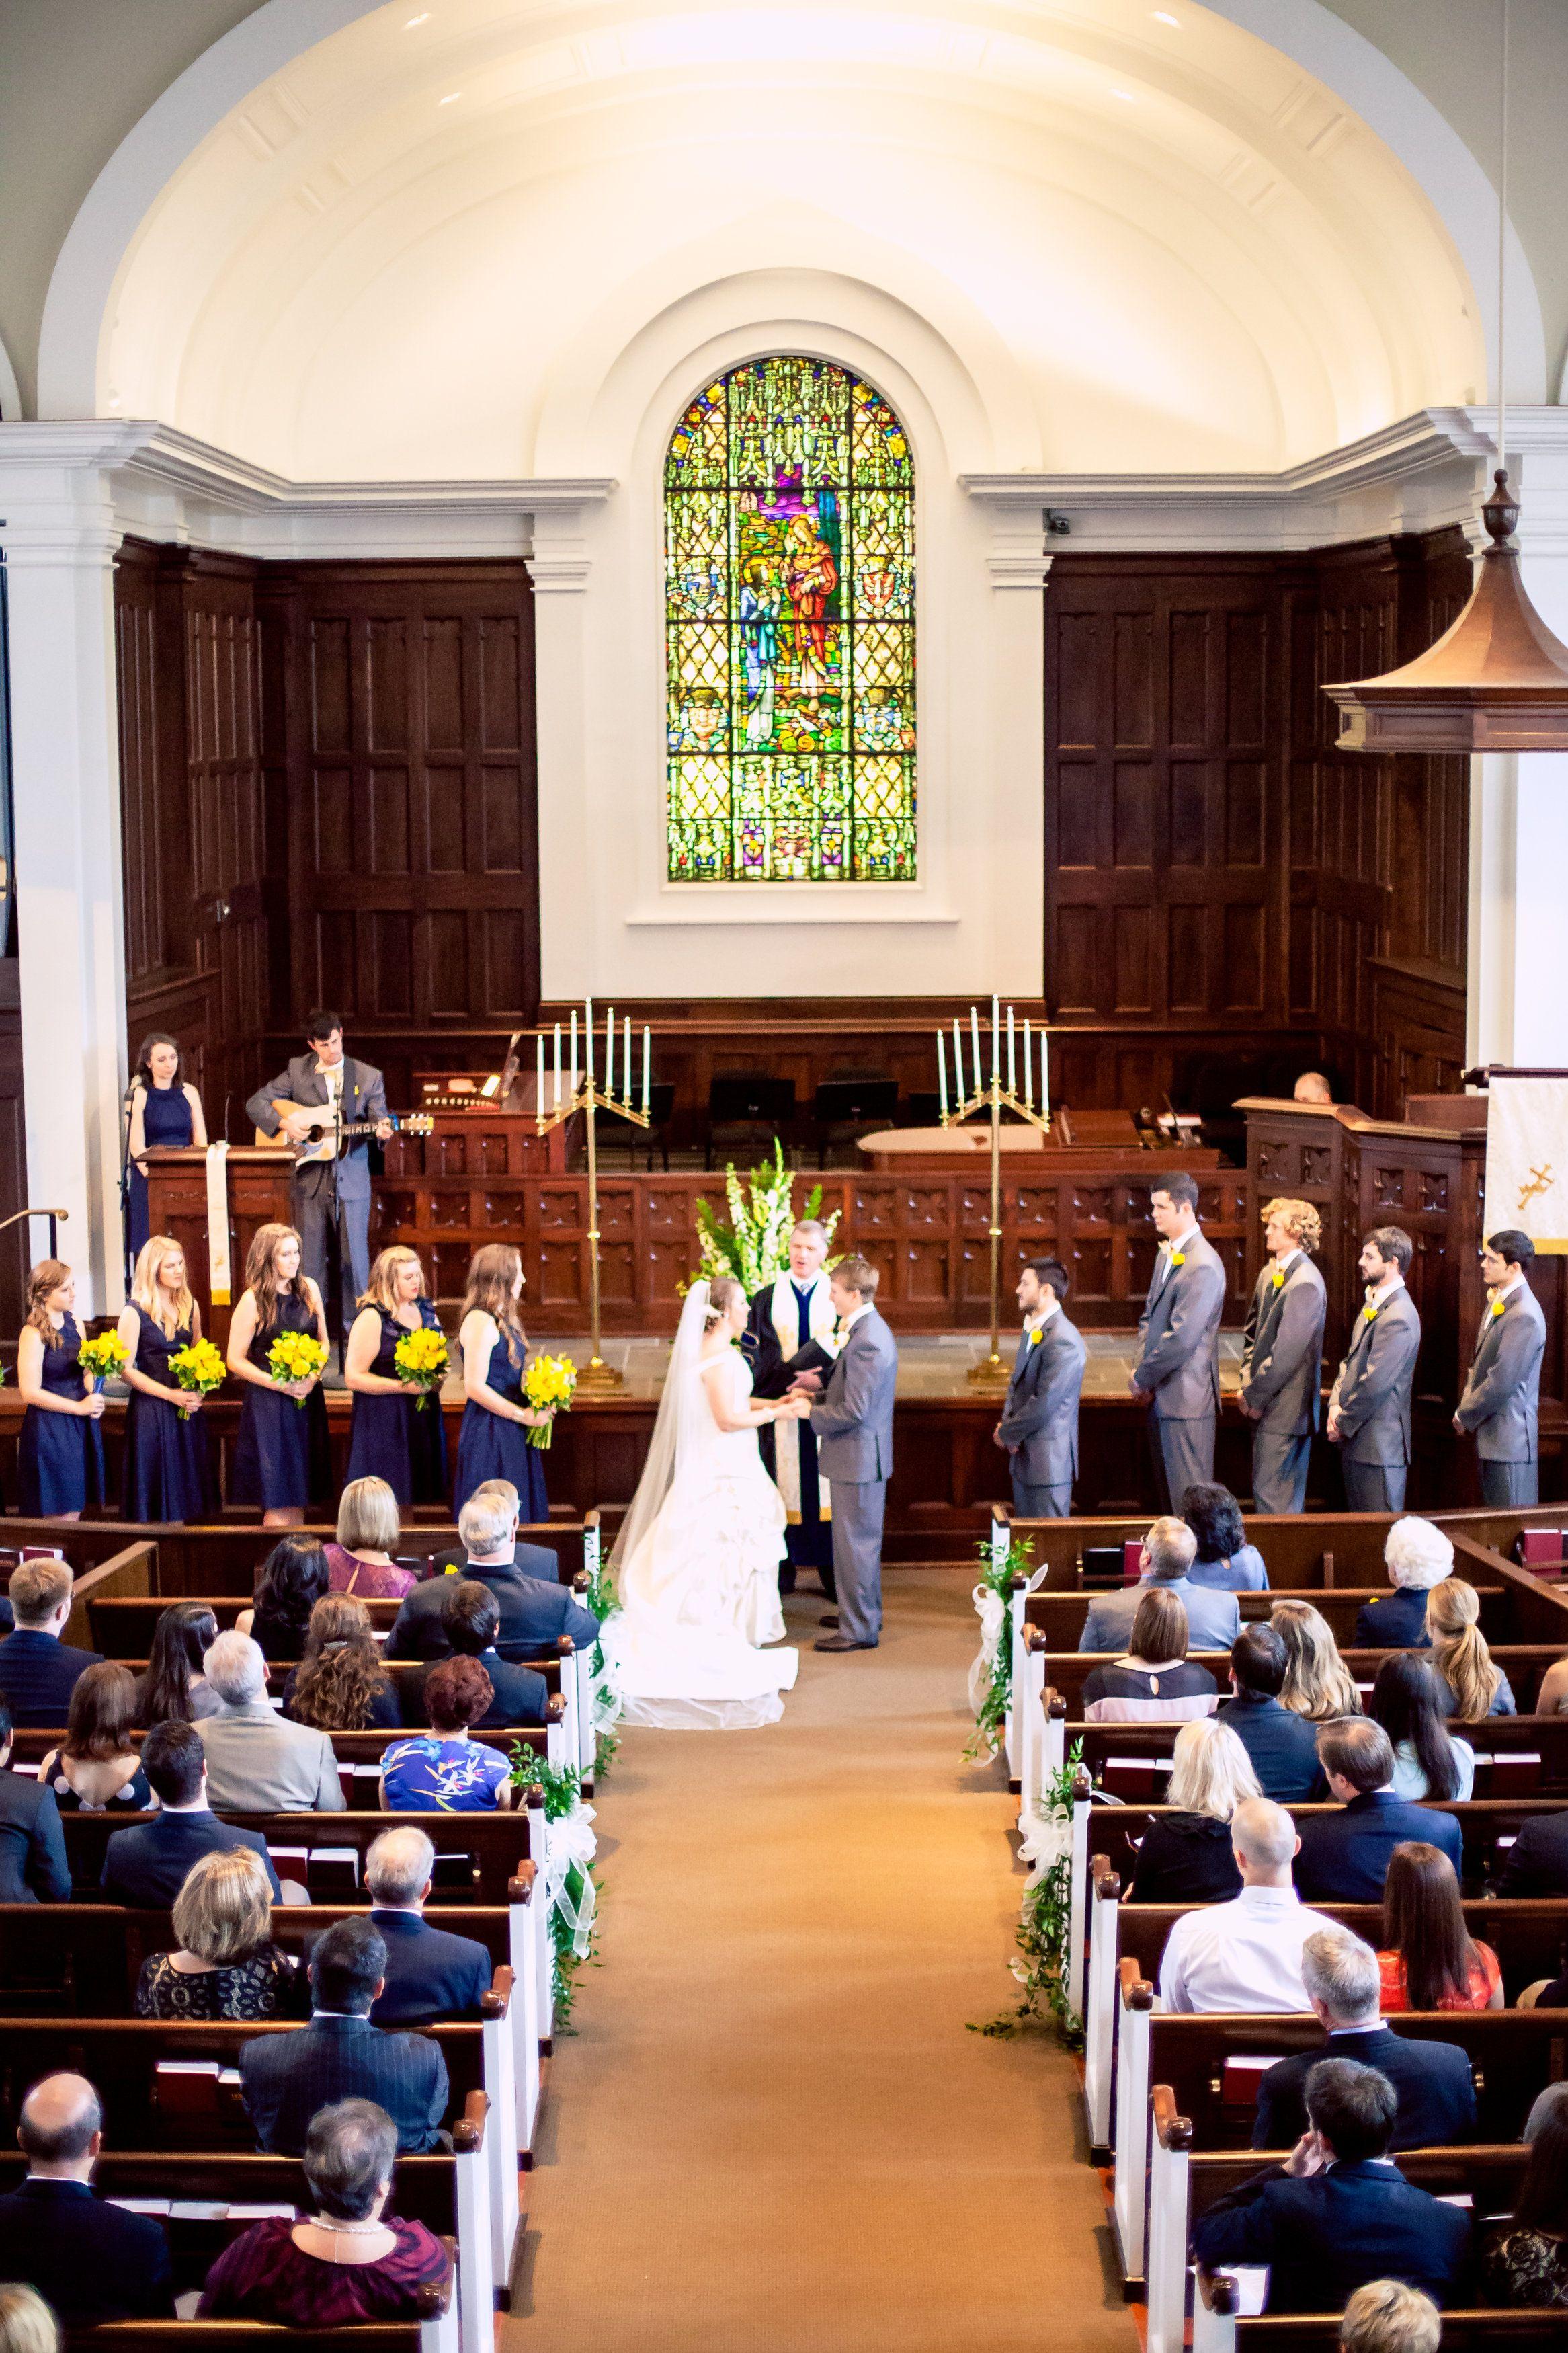 Home | Church wedding ceremony, Blue yellow weddings ...